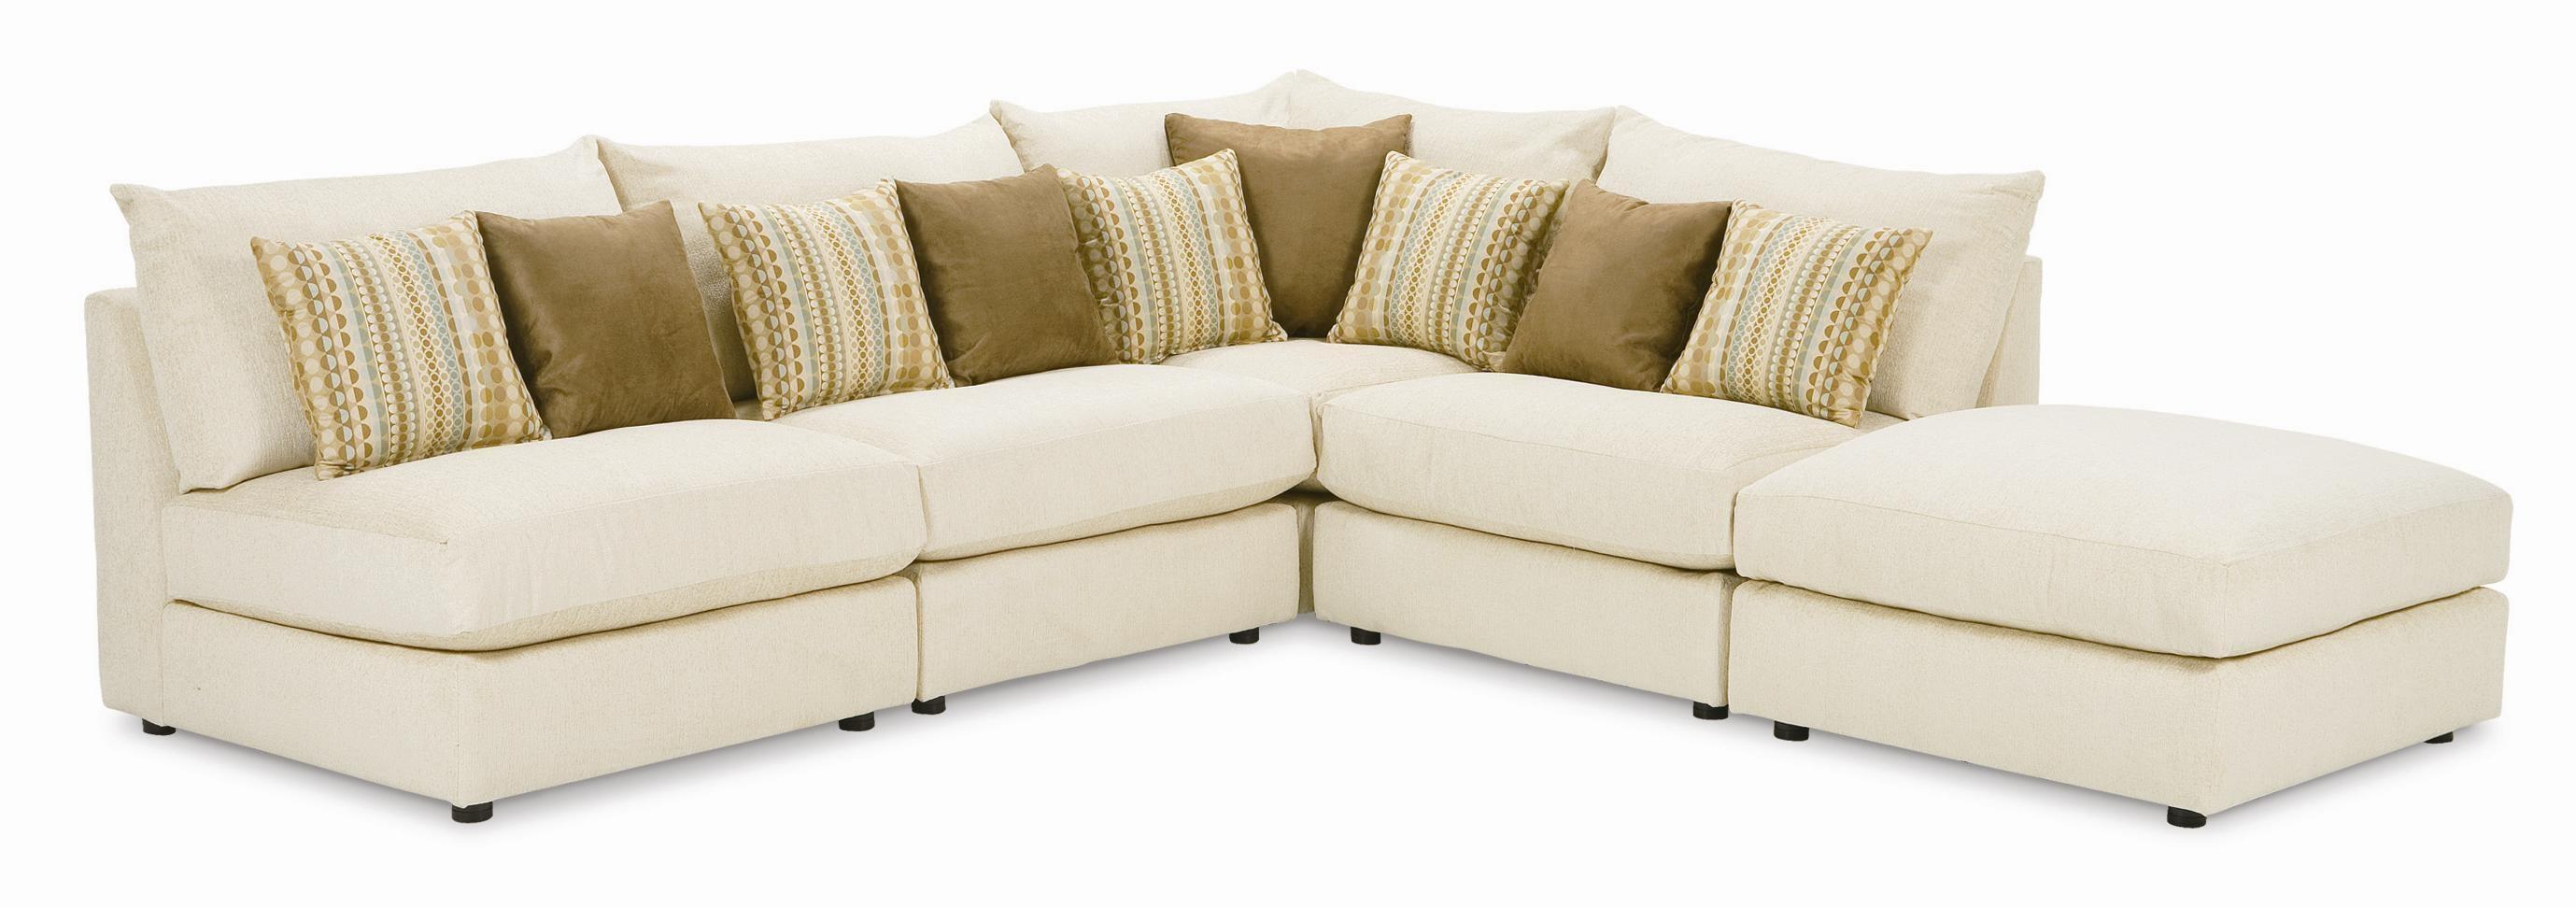 Rowe Tempo Five Piece Armless Sectional Sofa – Ahfa – Sofa Regarding Rowe Sectional Sofas (View 11 of 20)